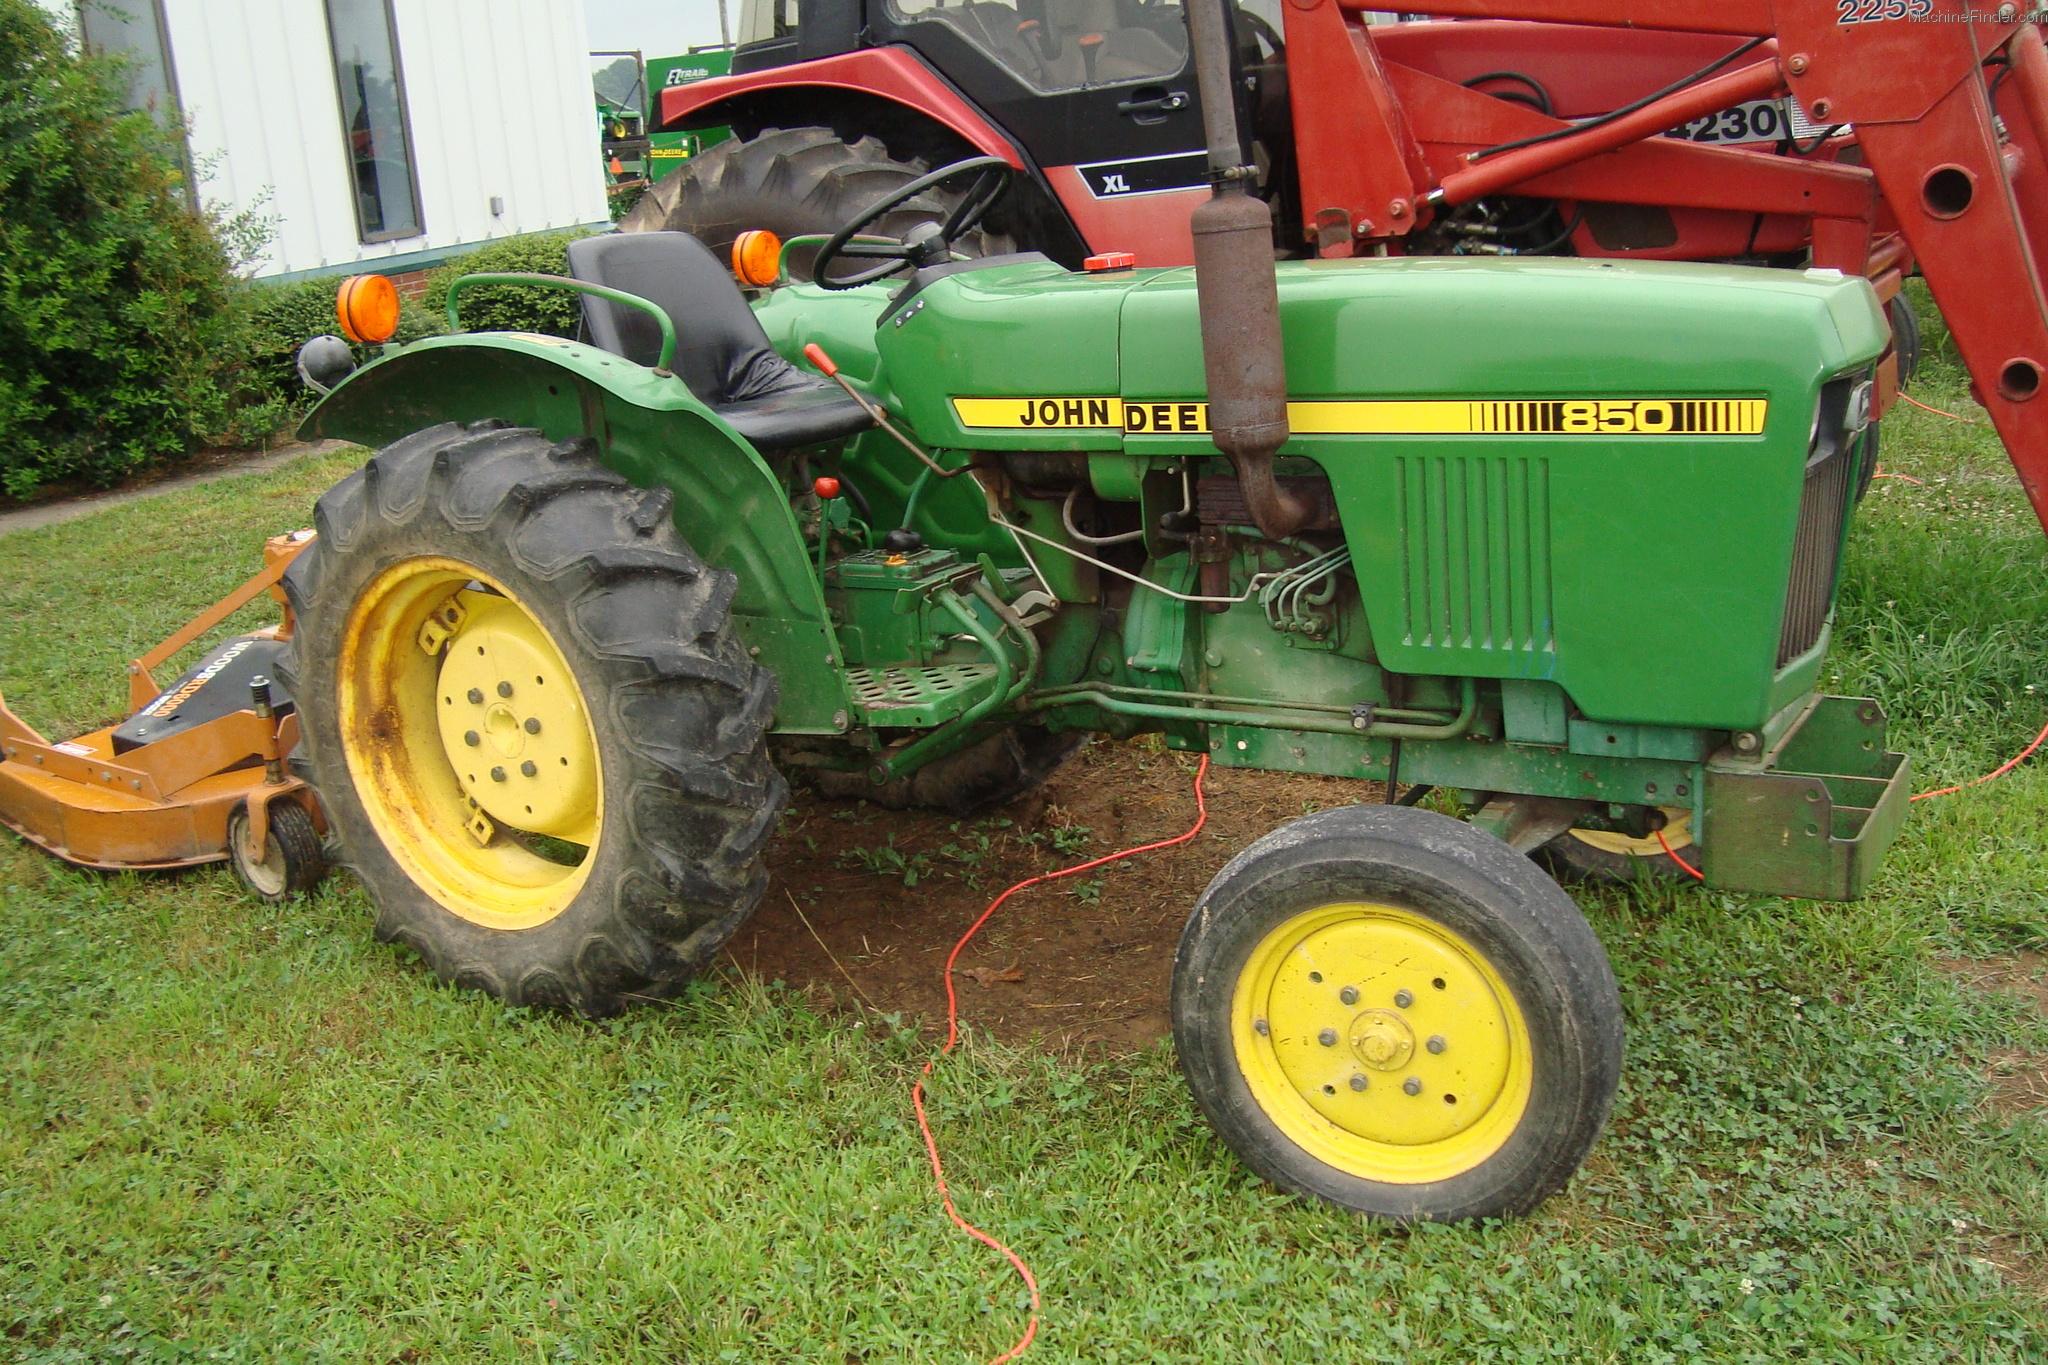 1983 John Deere 850 Tractors - Compact (1-40hp.) - John ...